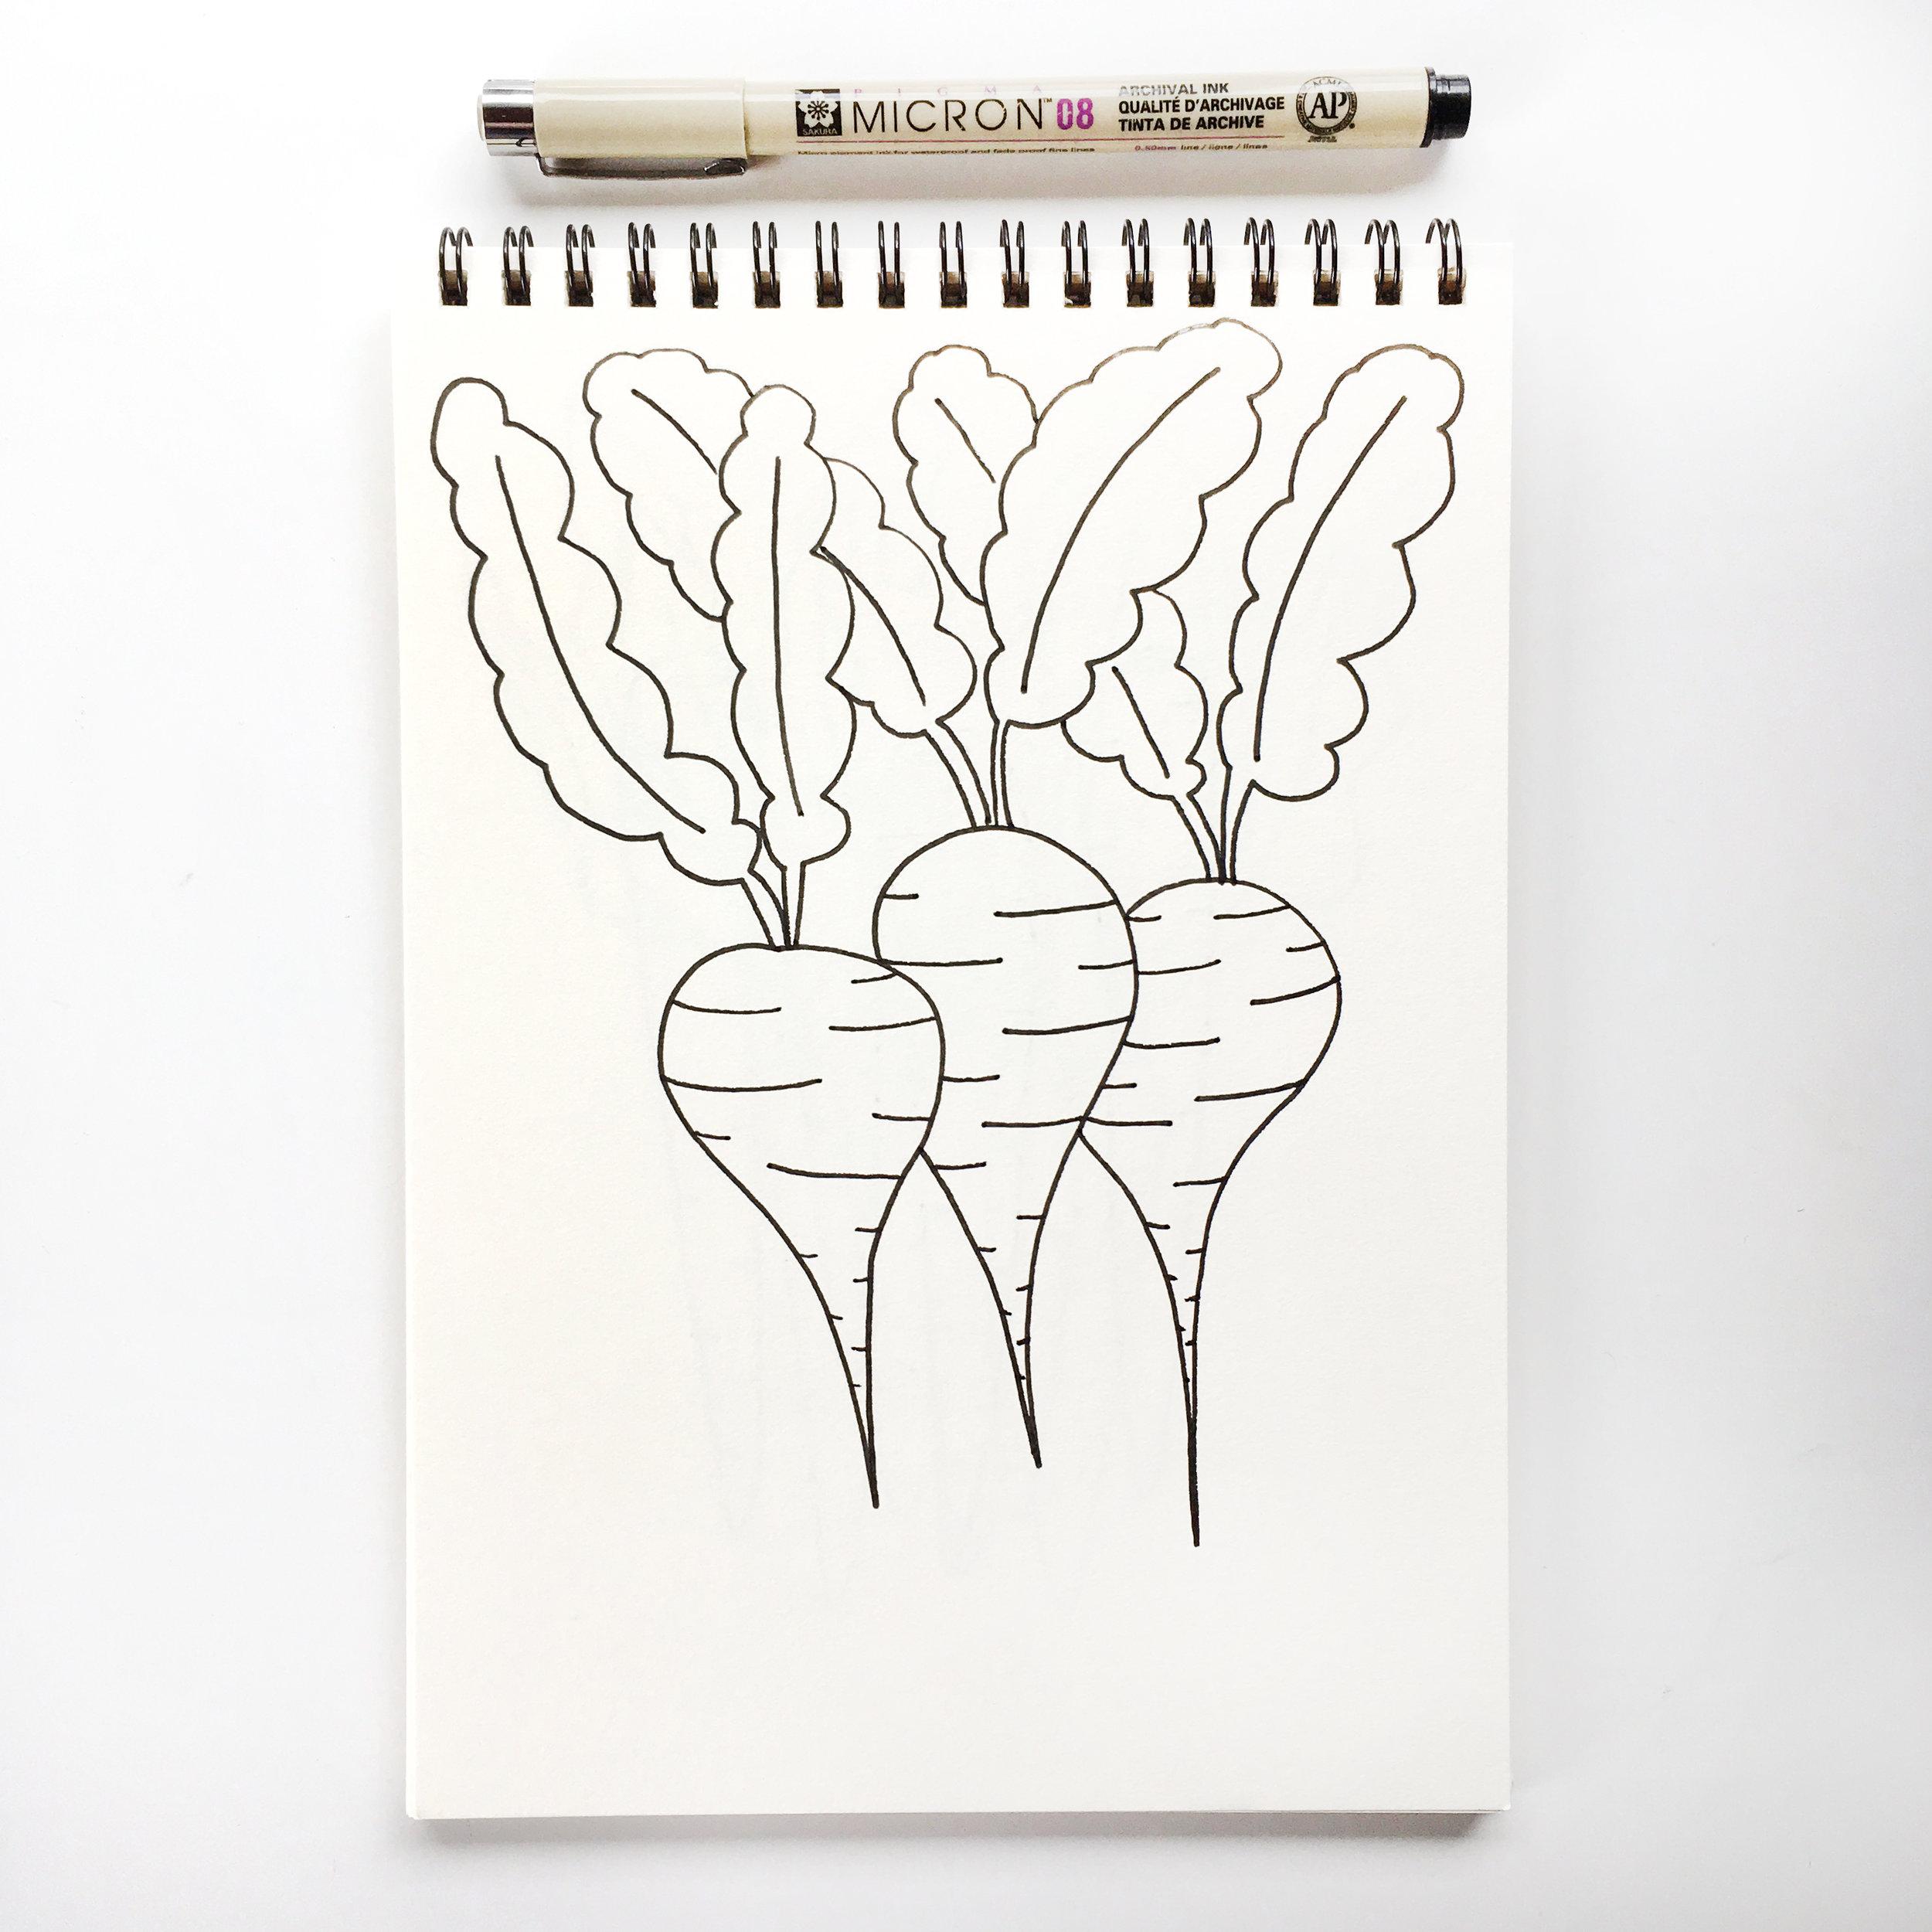 Beets Drawing in Sketchbook with Pen.jpg